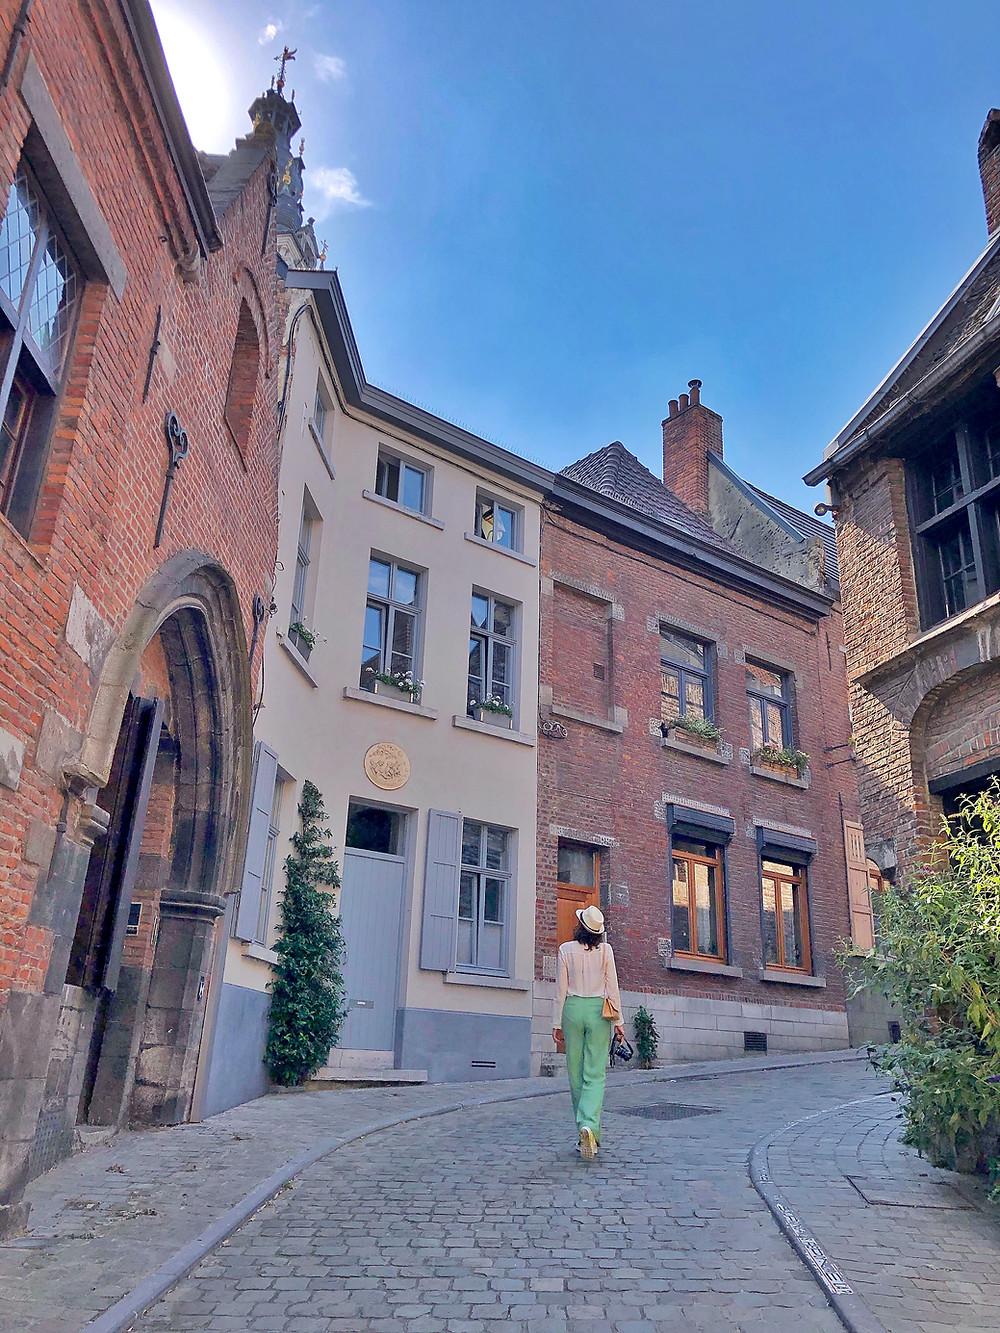 Lonnies Planet in Mons Belgium